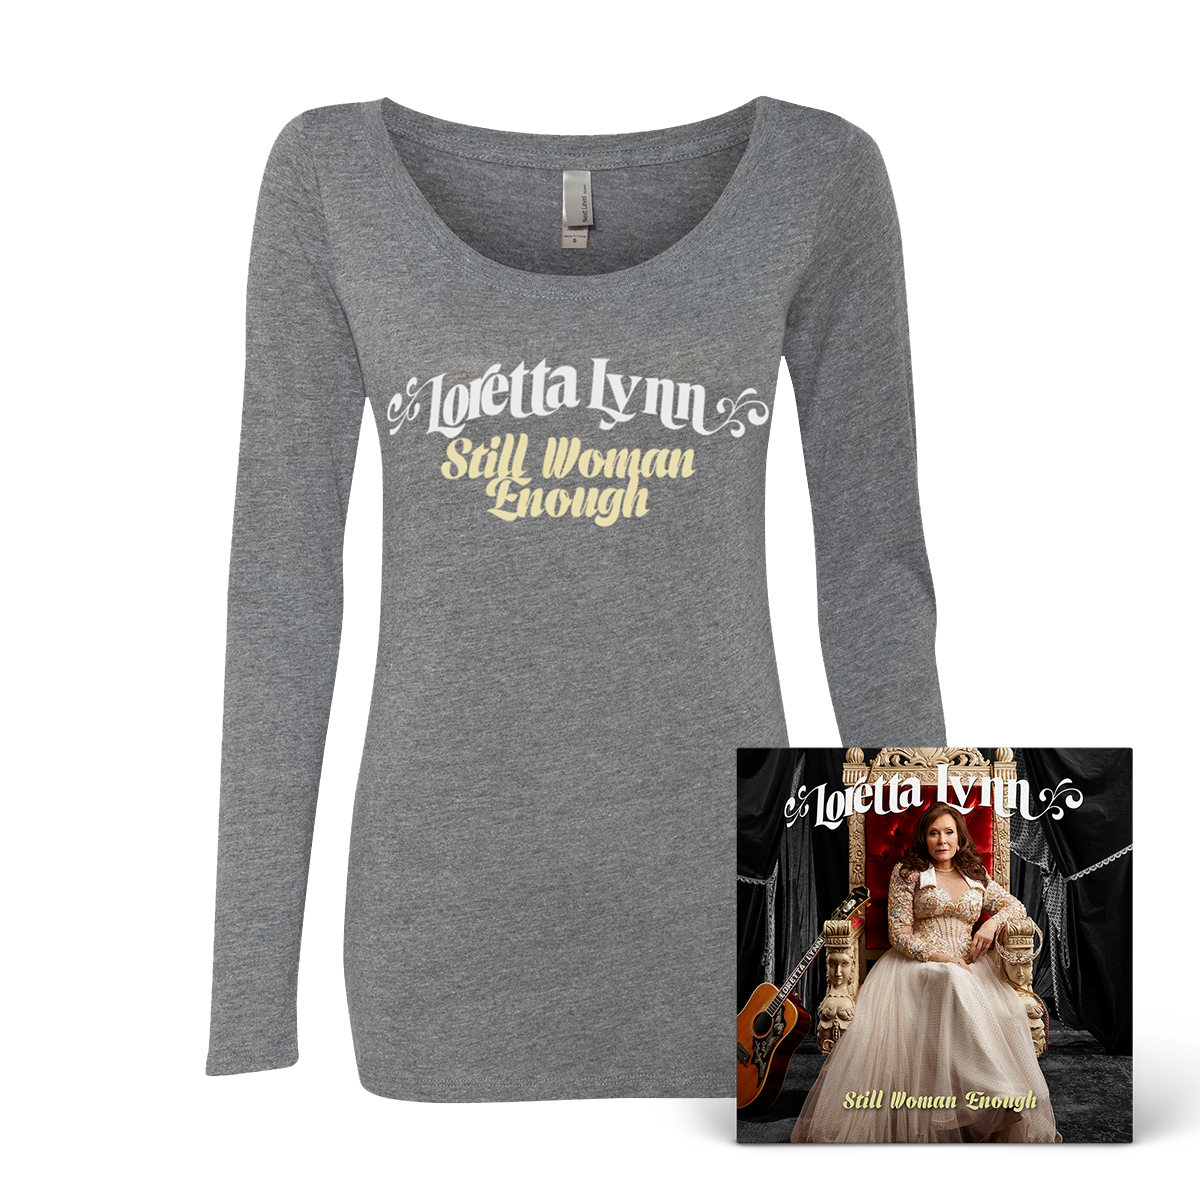 Still Woman Enough Ladies T-Shirt - Grey